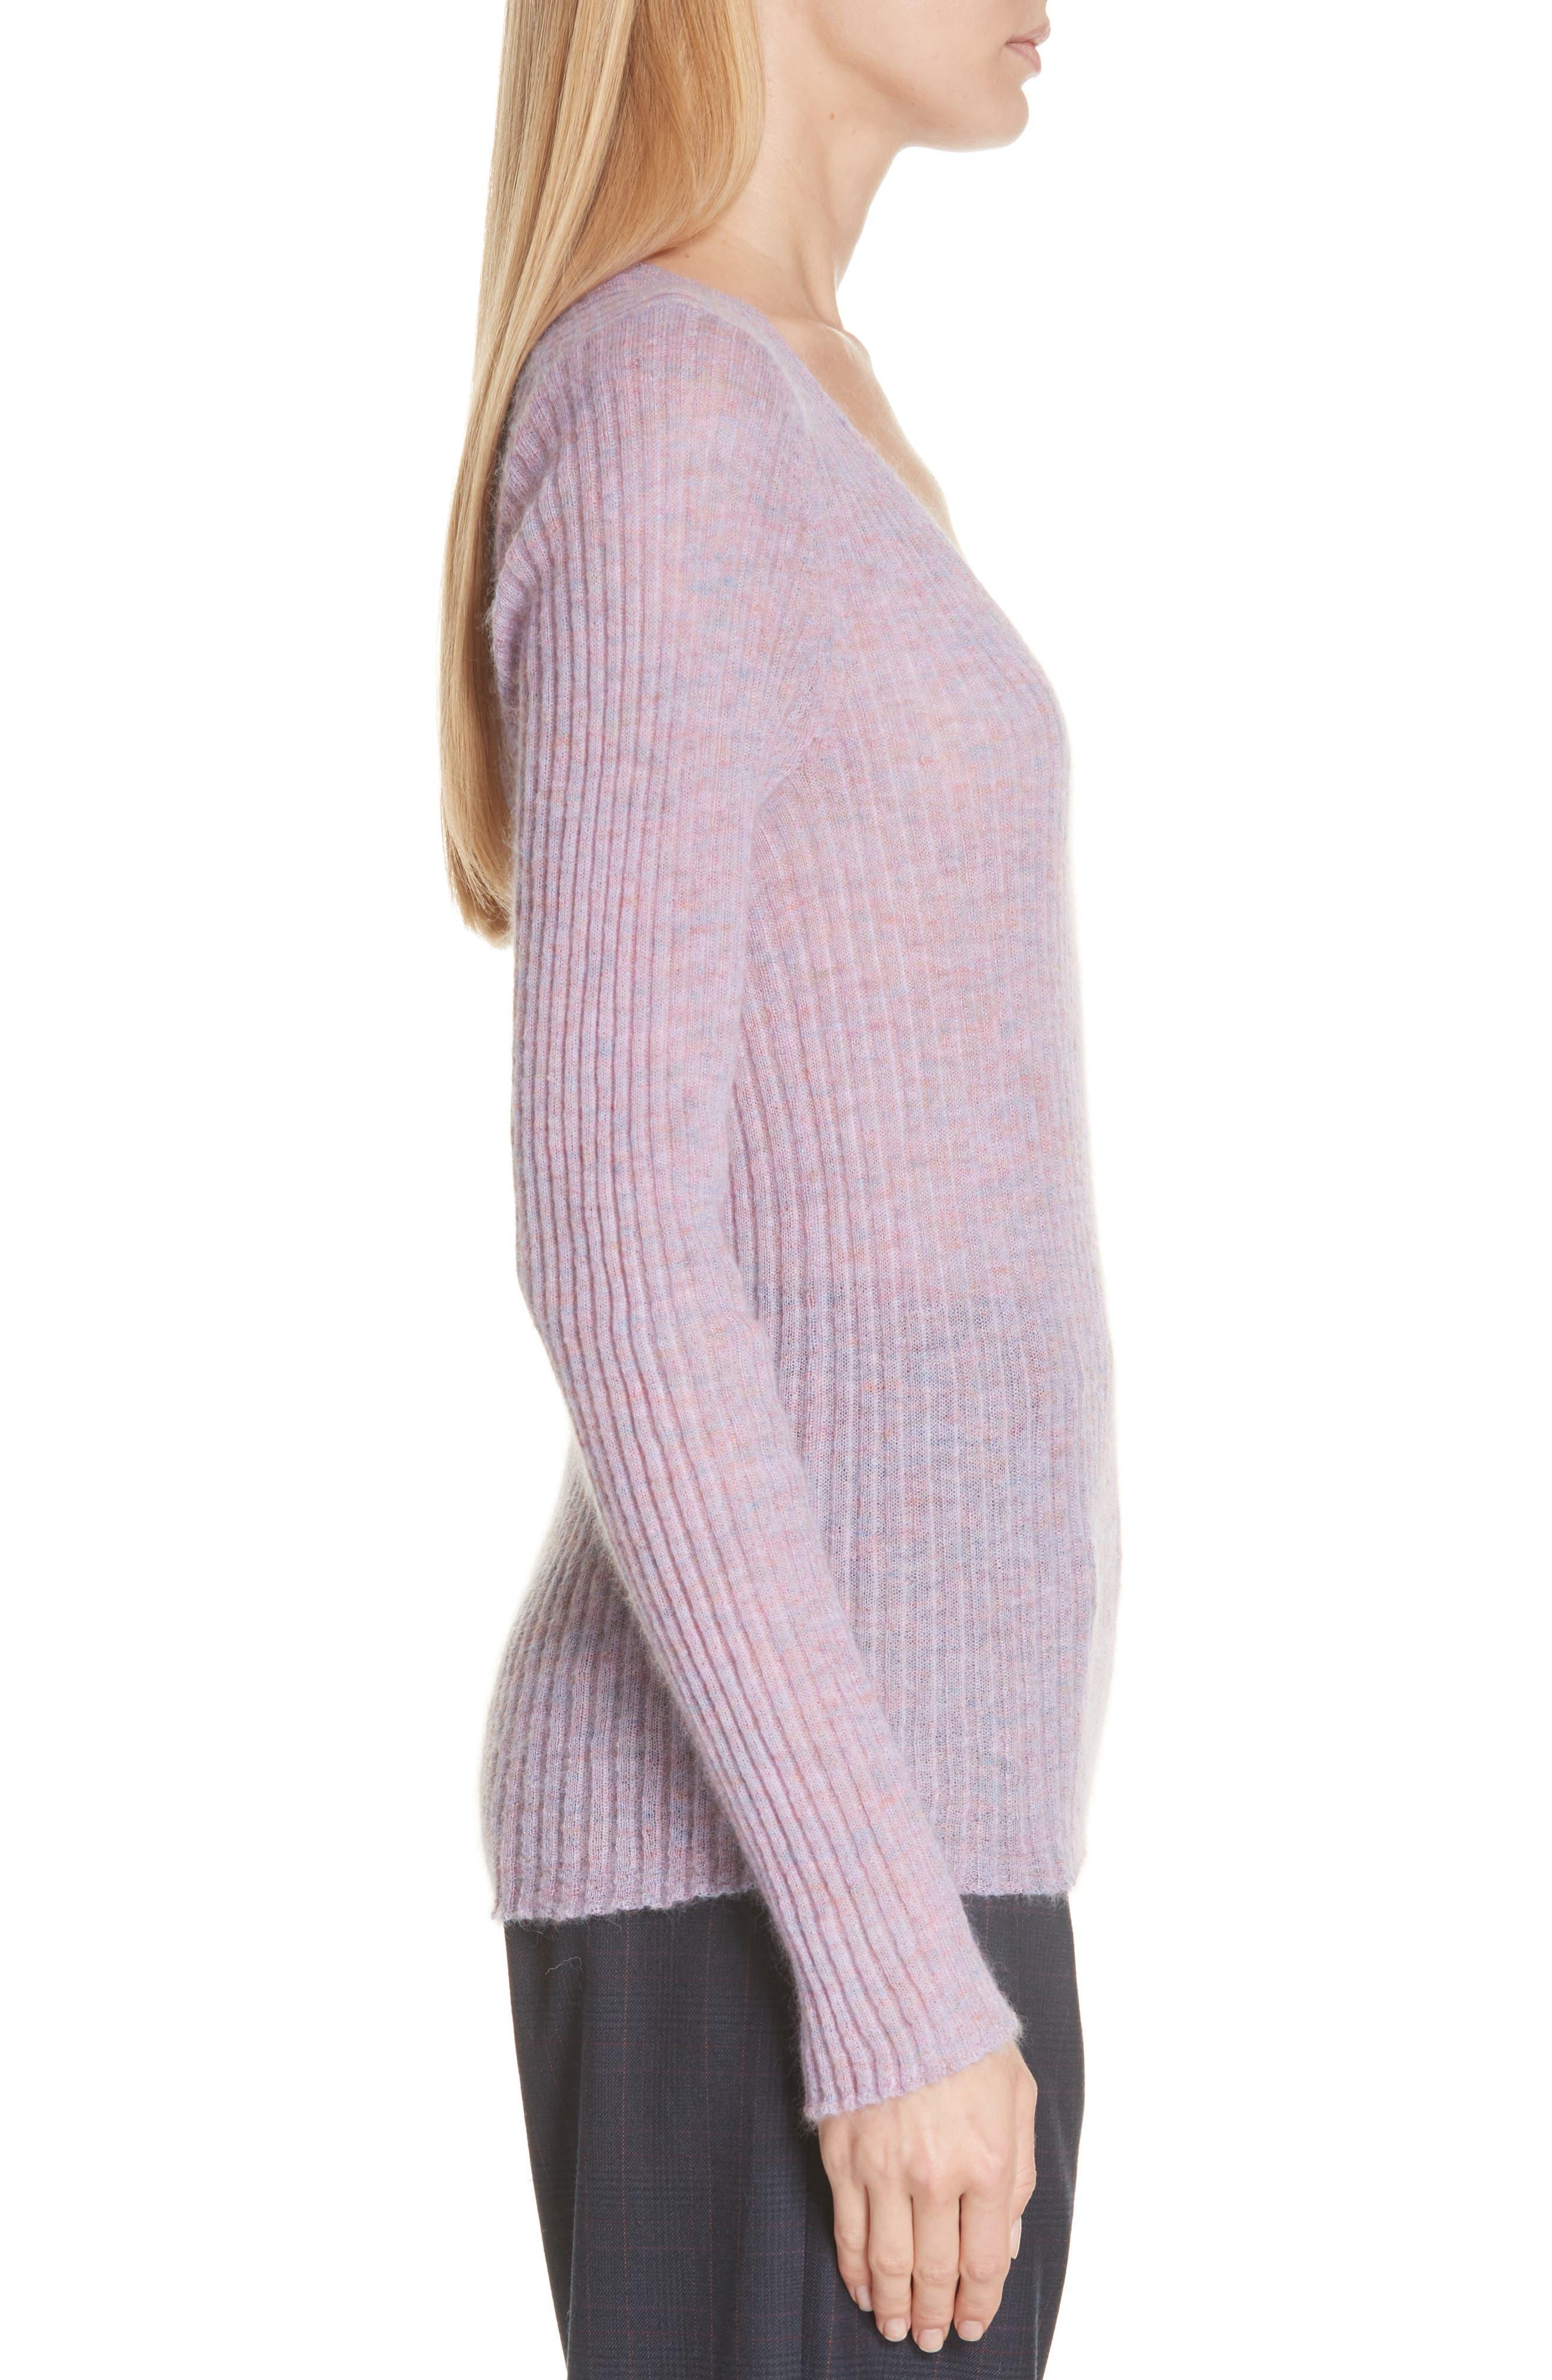 RAG & BONE, Donna Mohair Blend Sweater, Alternate thumbnail 3, color, LILAC